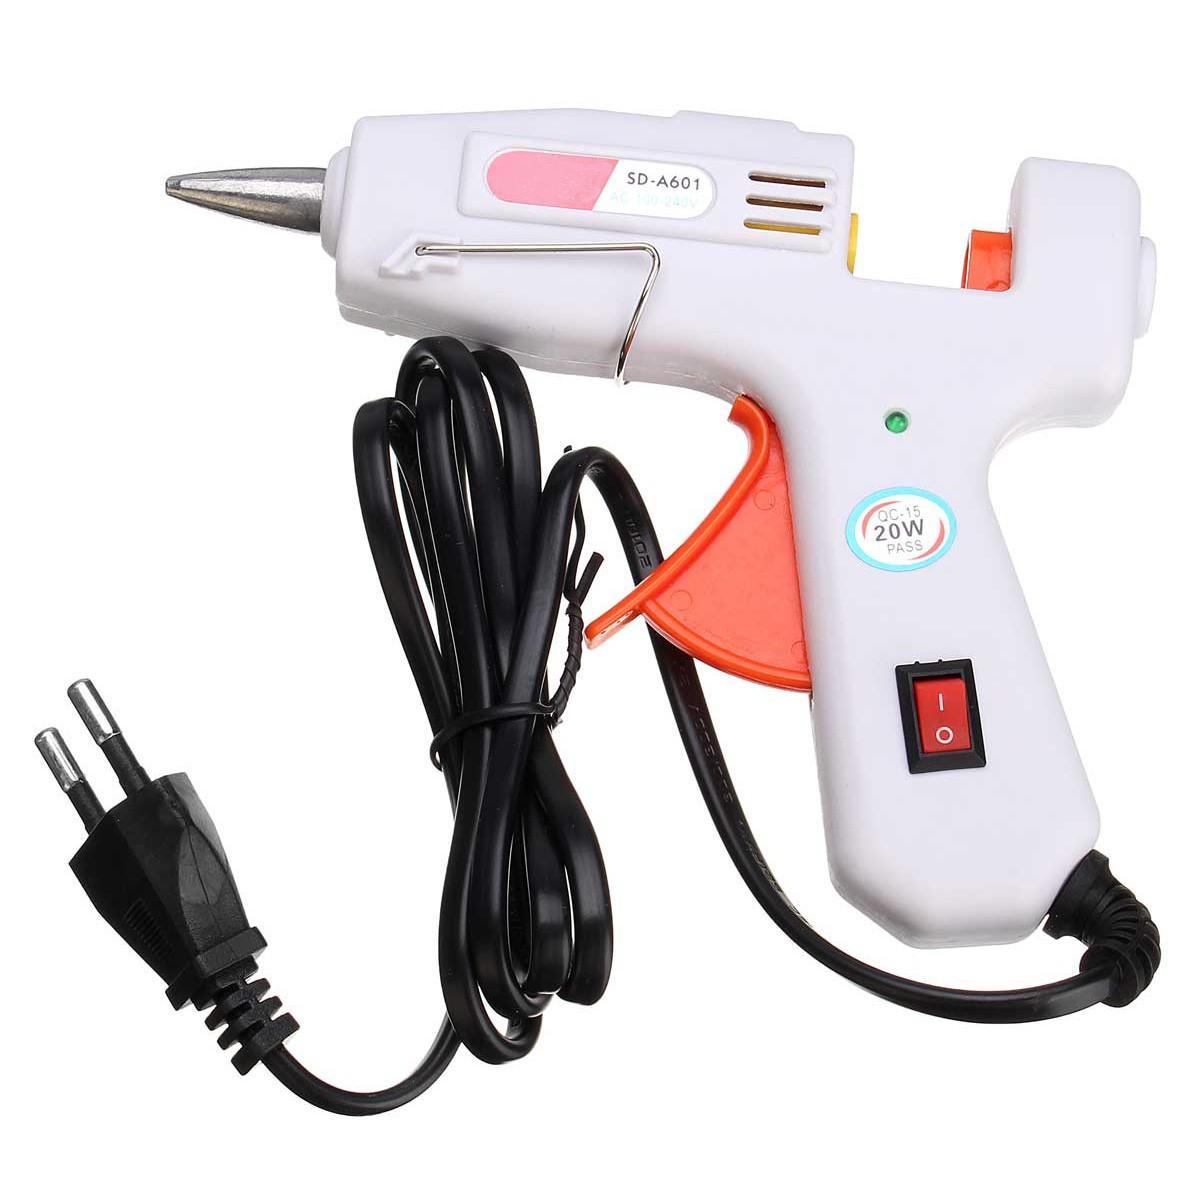 20W White Heating Hot Melt Electric Glue Crafts Repair Tools